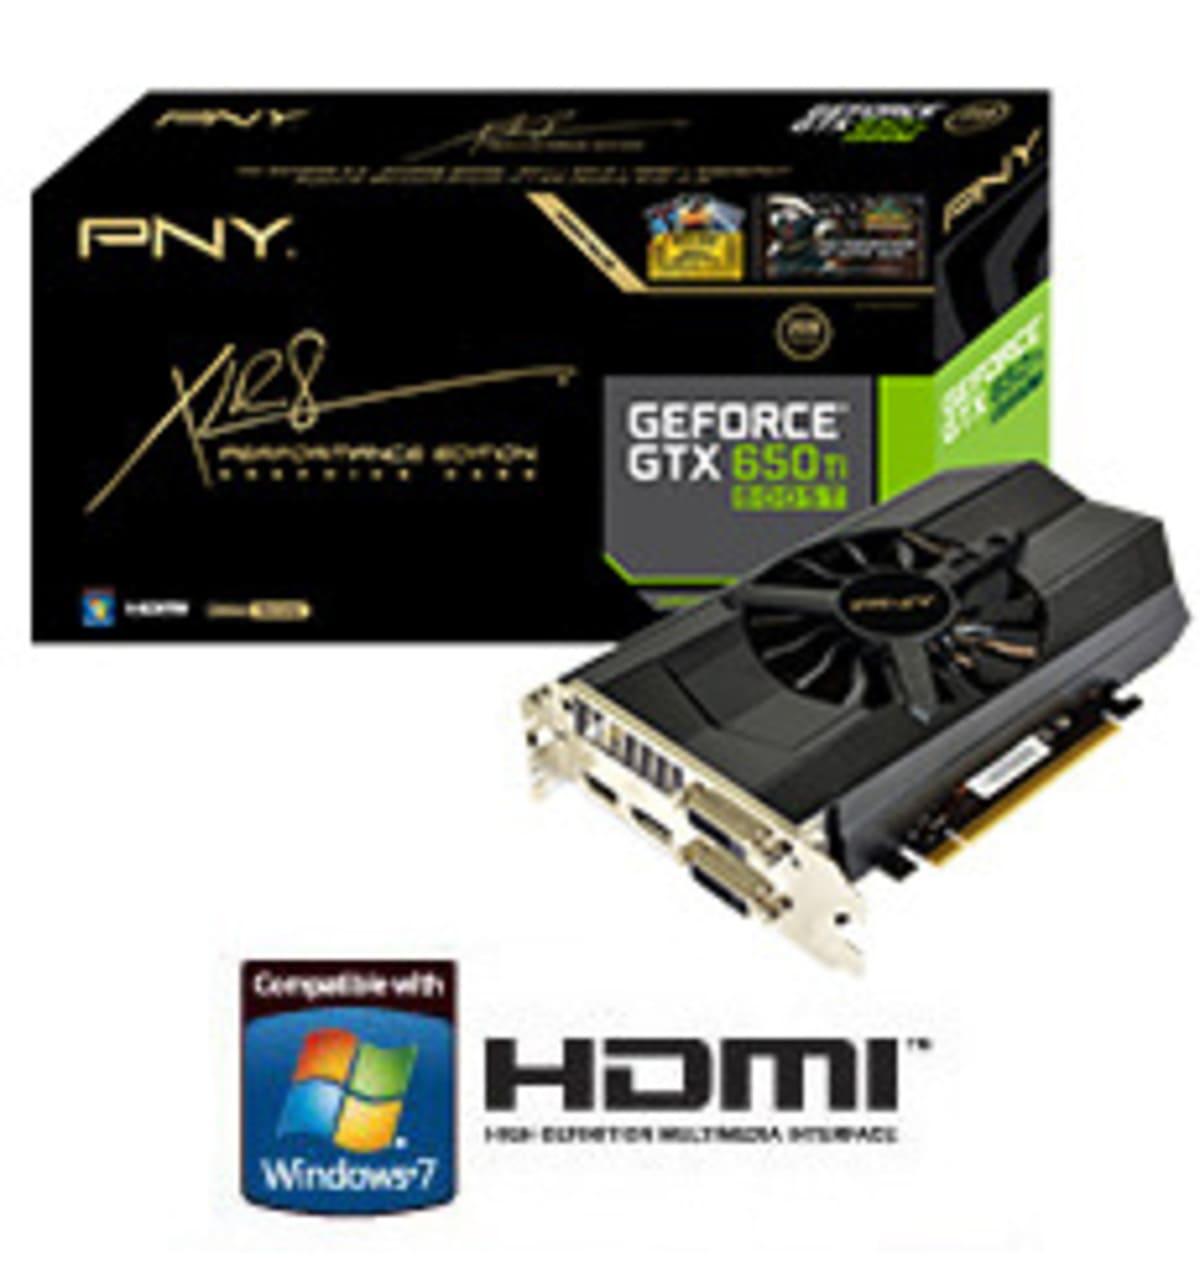 lchapuzasinformatico.com wp content uploads 2013 04 PNY XLR8 GeForce GTX 650 Ti Boost 01 0